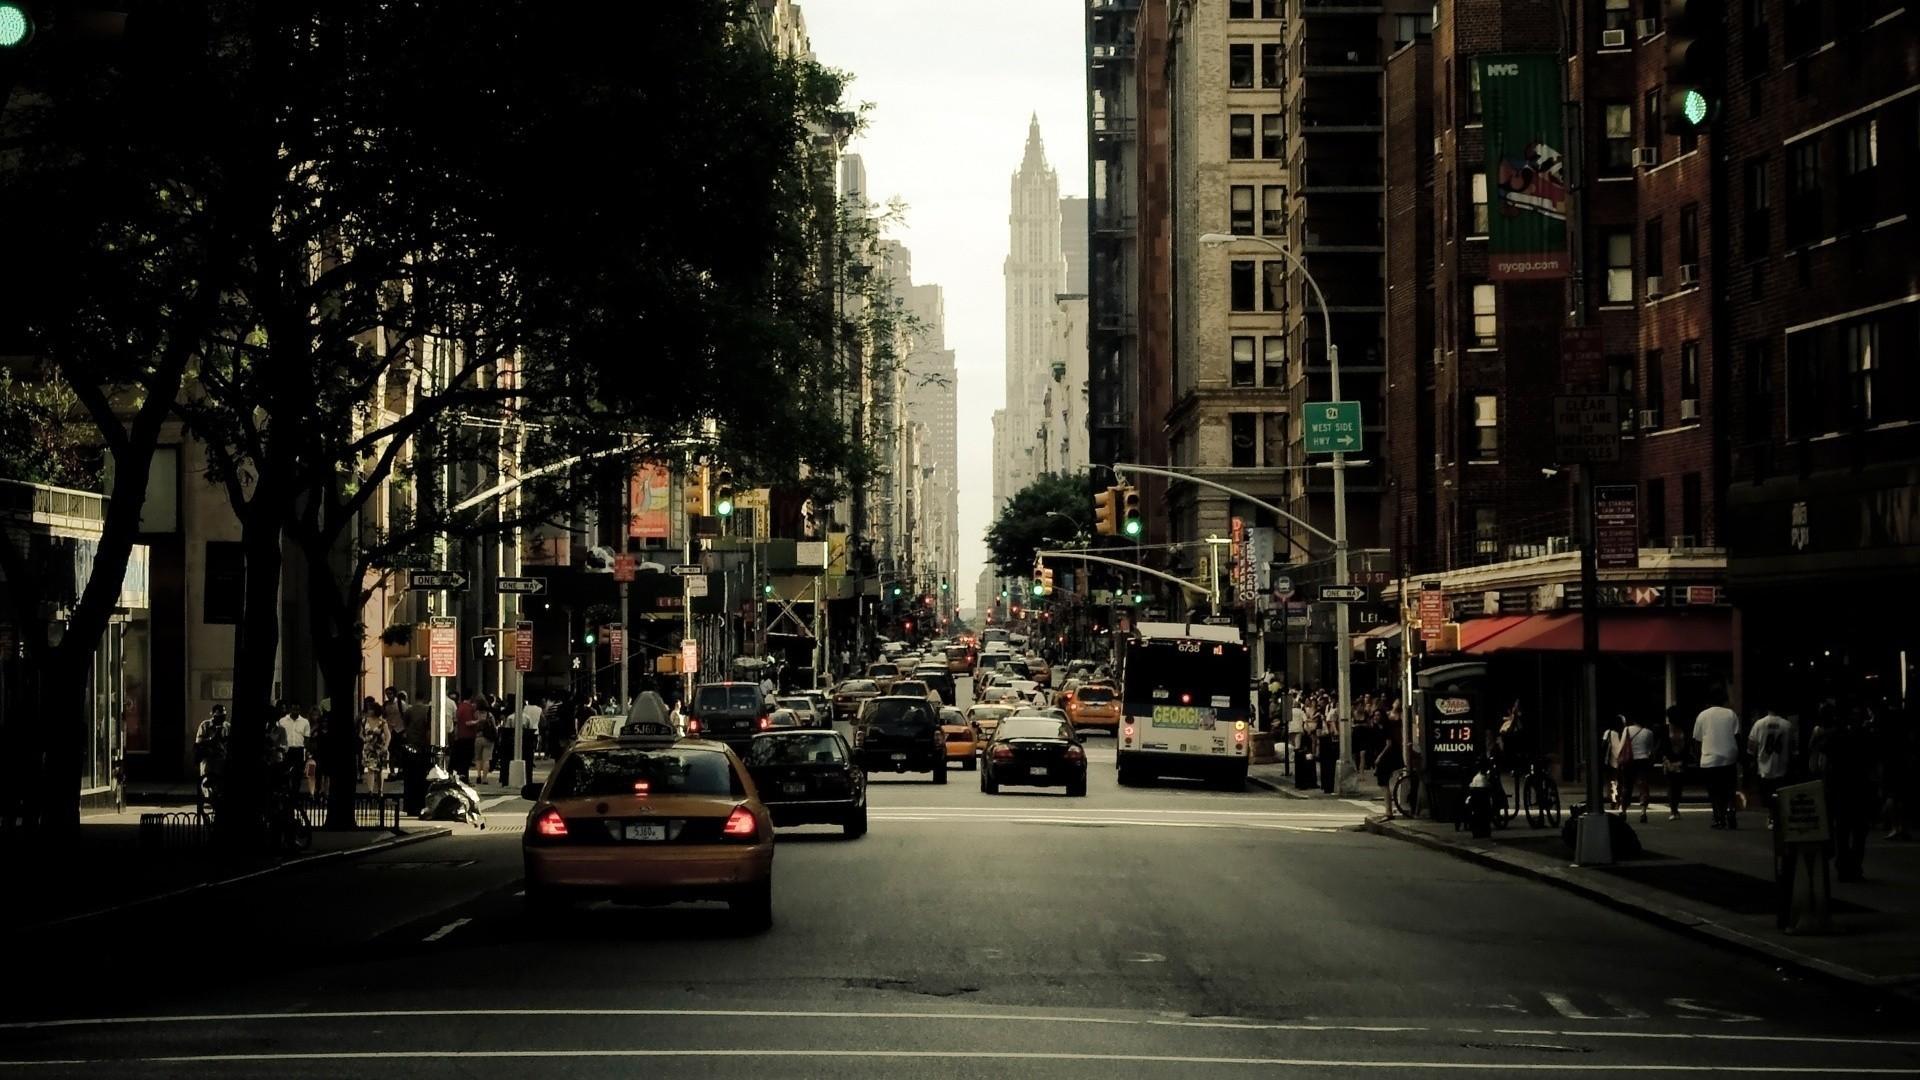 Wallpaper Jalan Cityscape Malam Kota New York Lalu Lintas